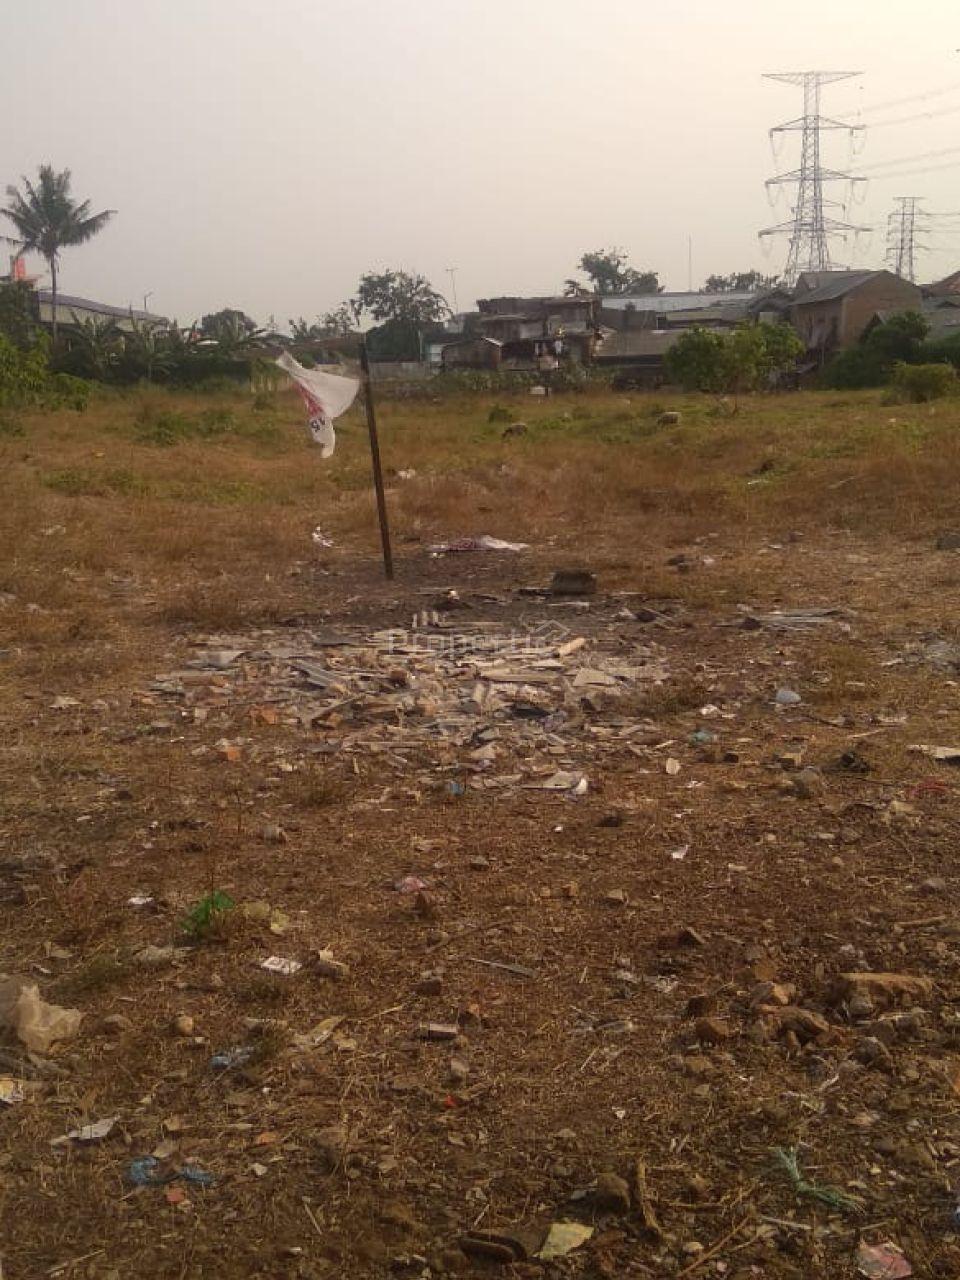 Land for Housing in Kebon Pala, East Jakarta, DKI Jakarta